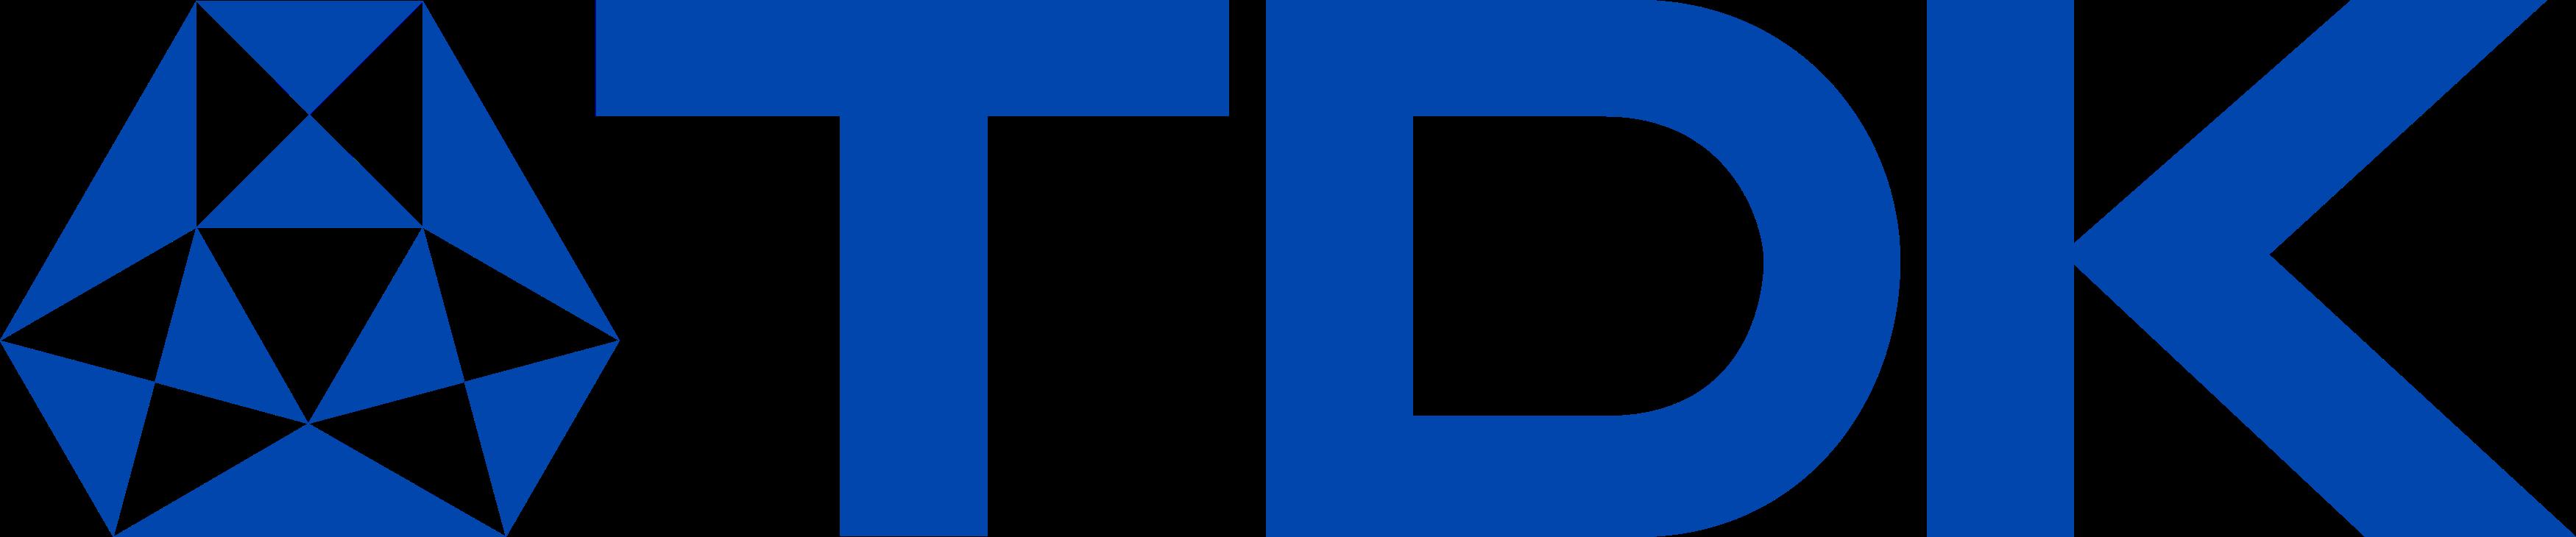 tdk logo - TDK Logo